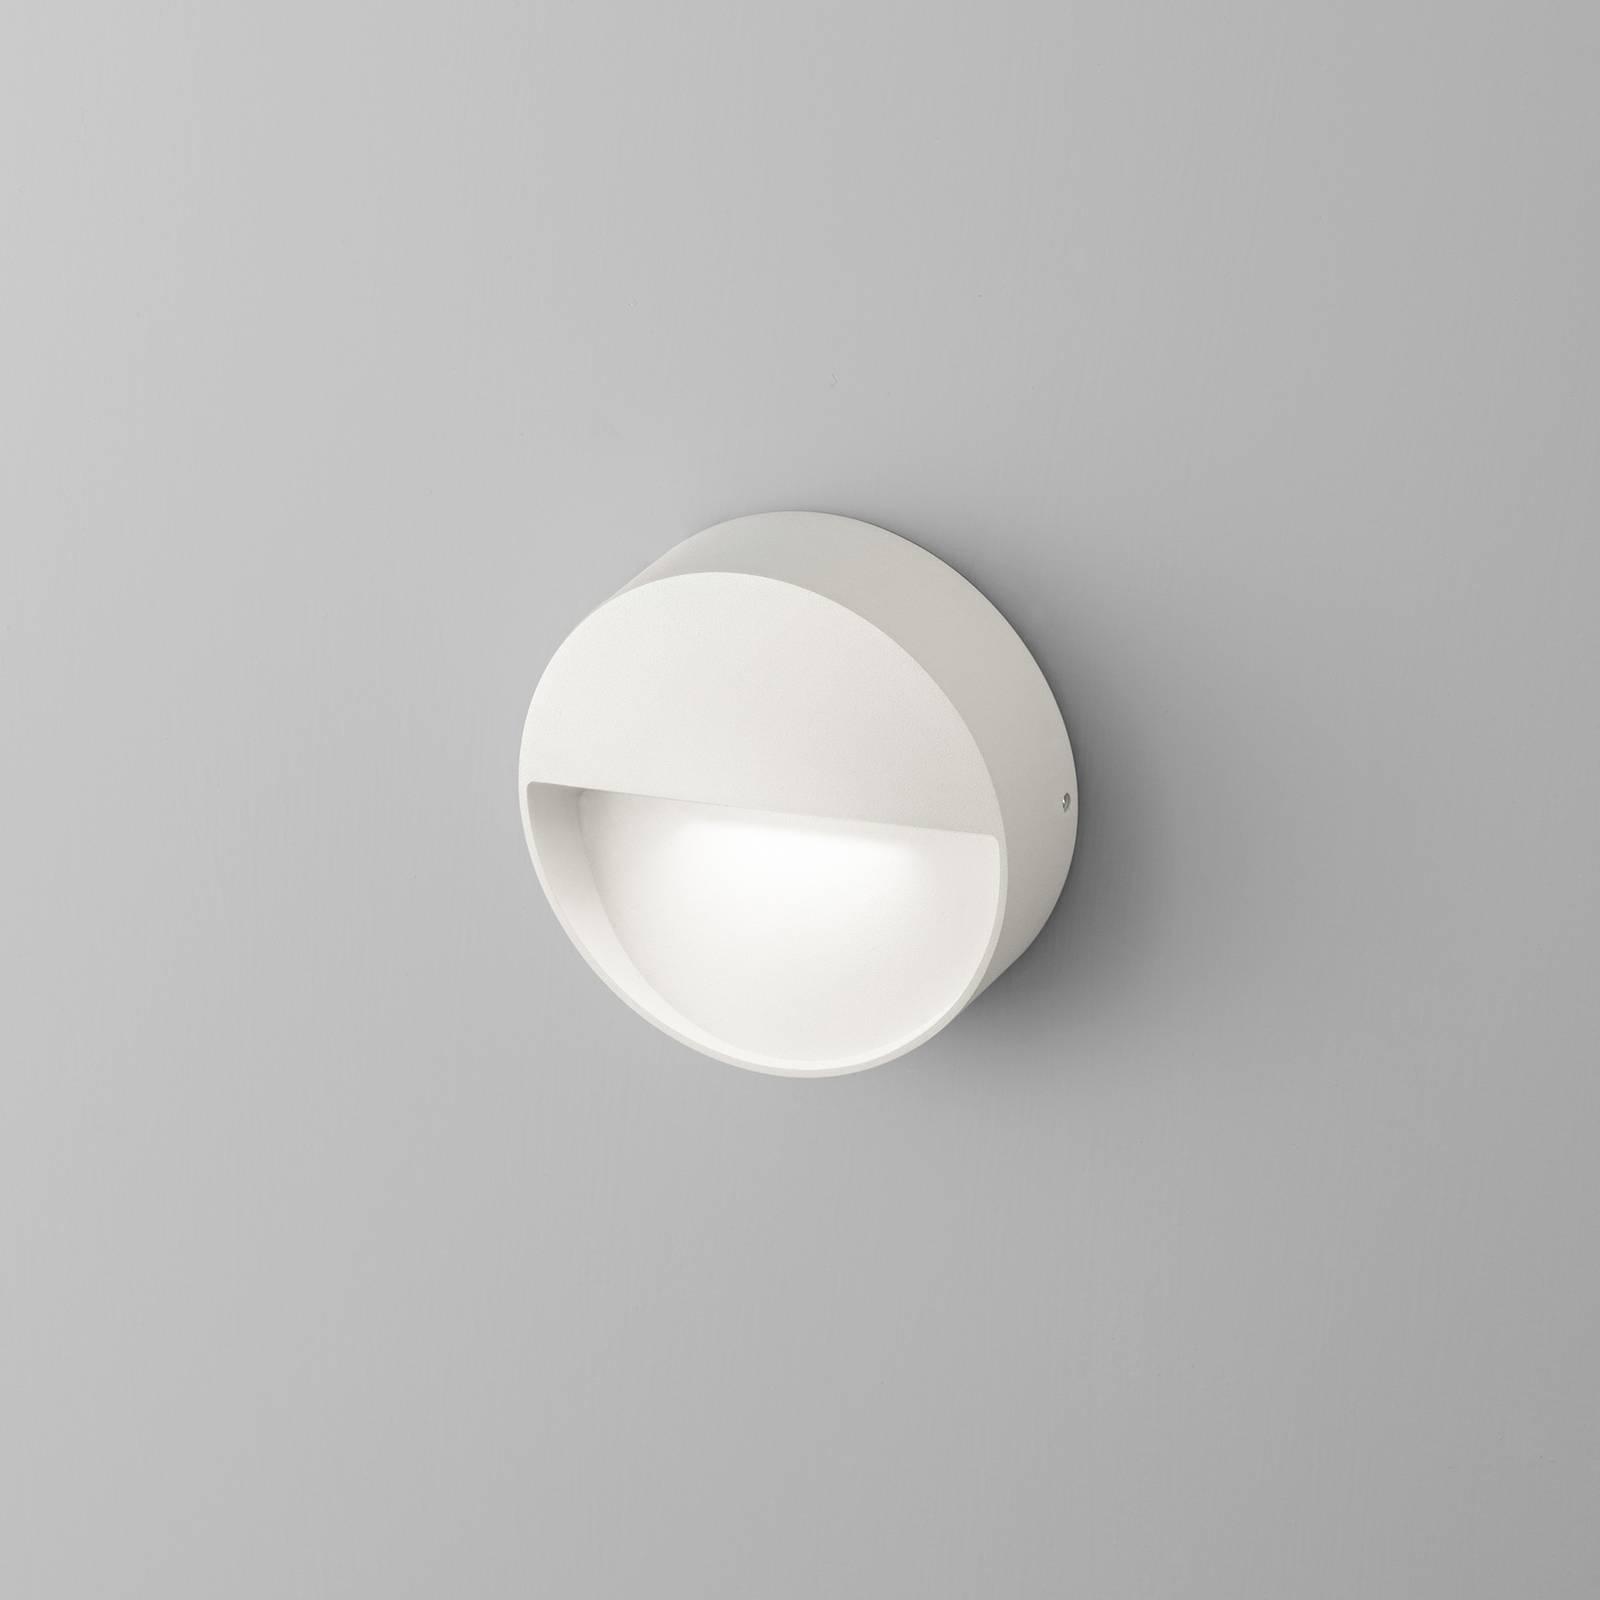 Egger Vigo LED-Wandleuchte mit IP54, weiß